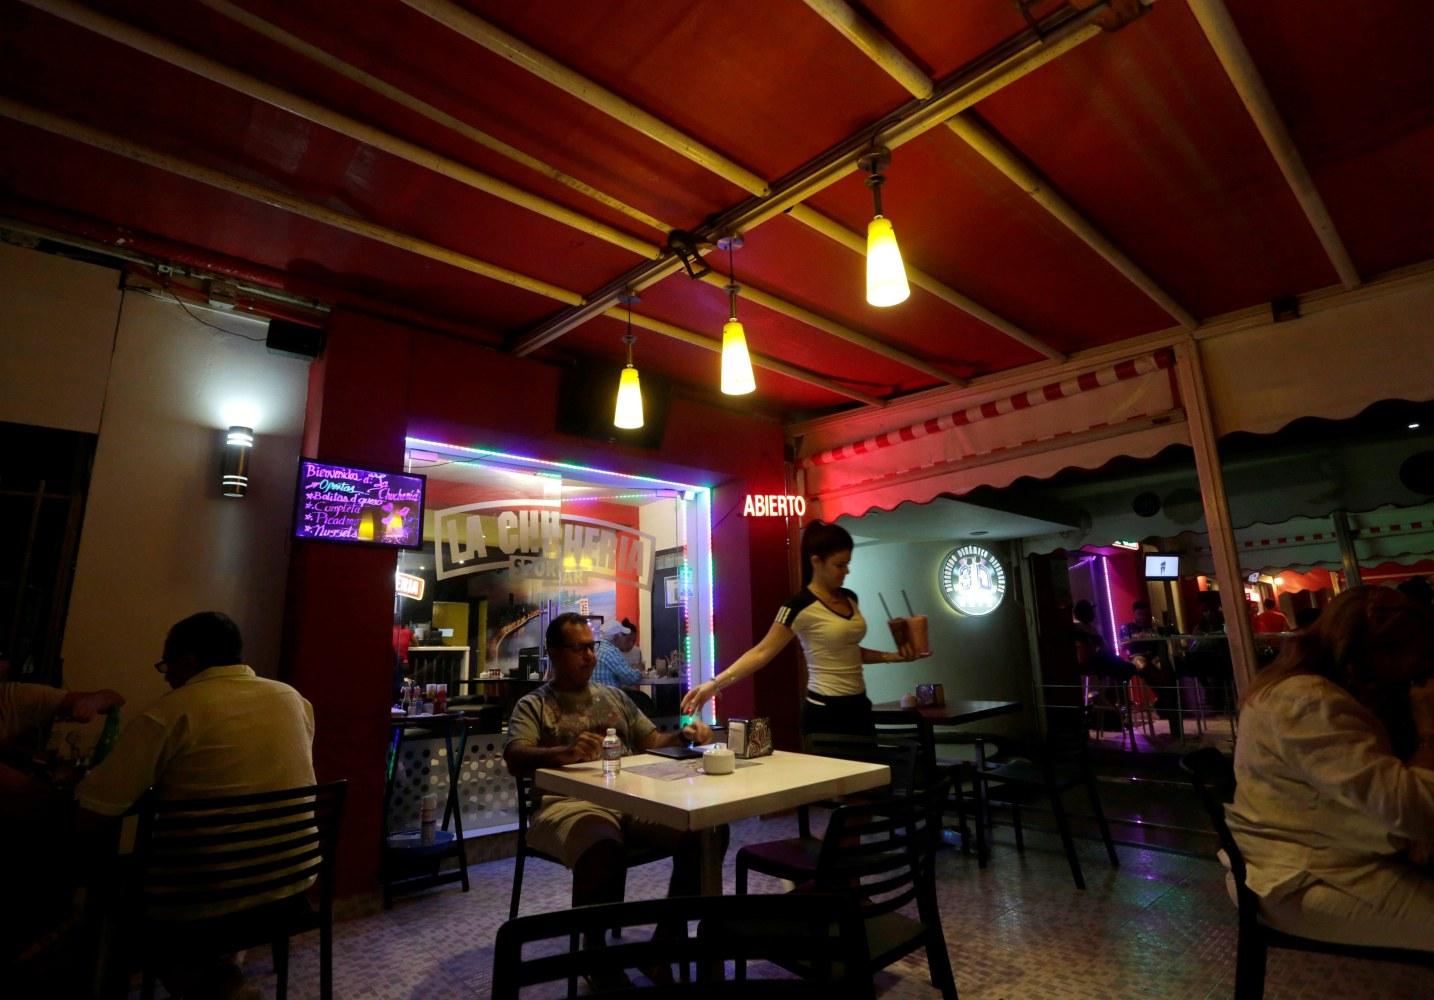 Cuba freezes new licenses for private restaurants in Havana